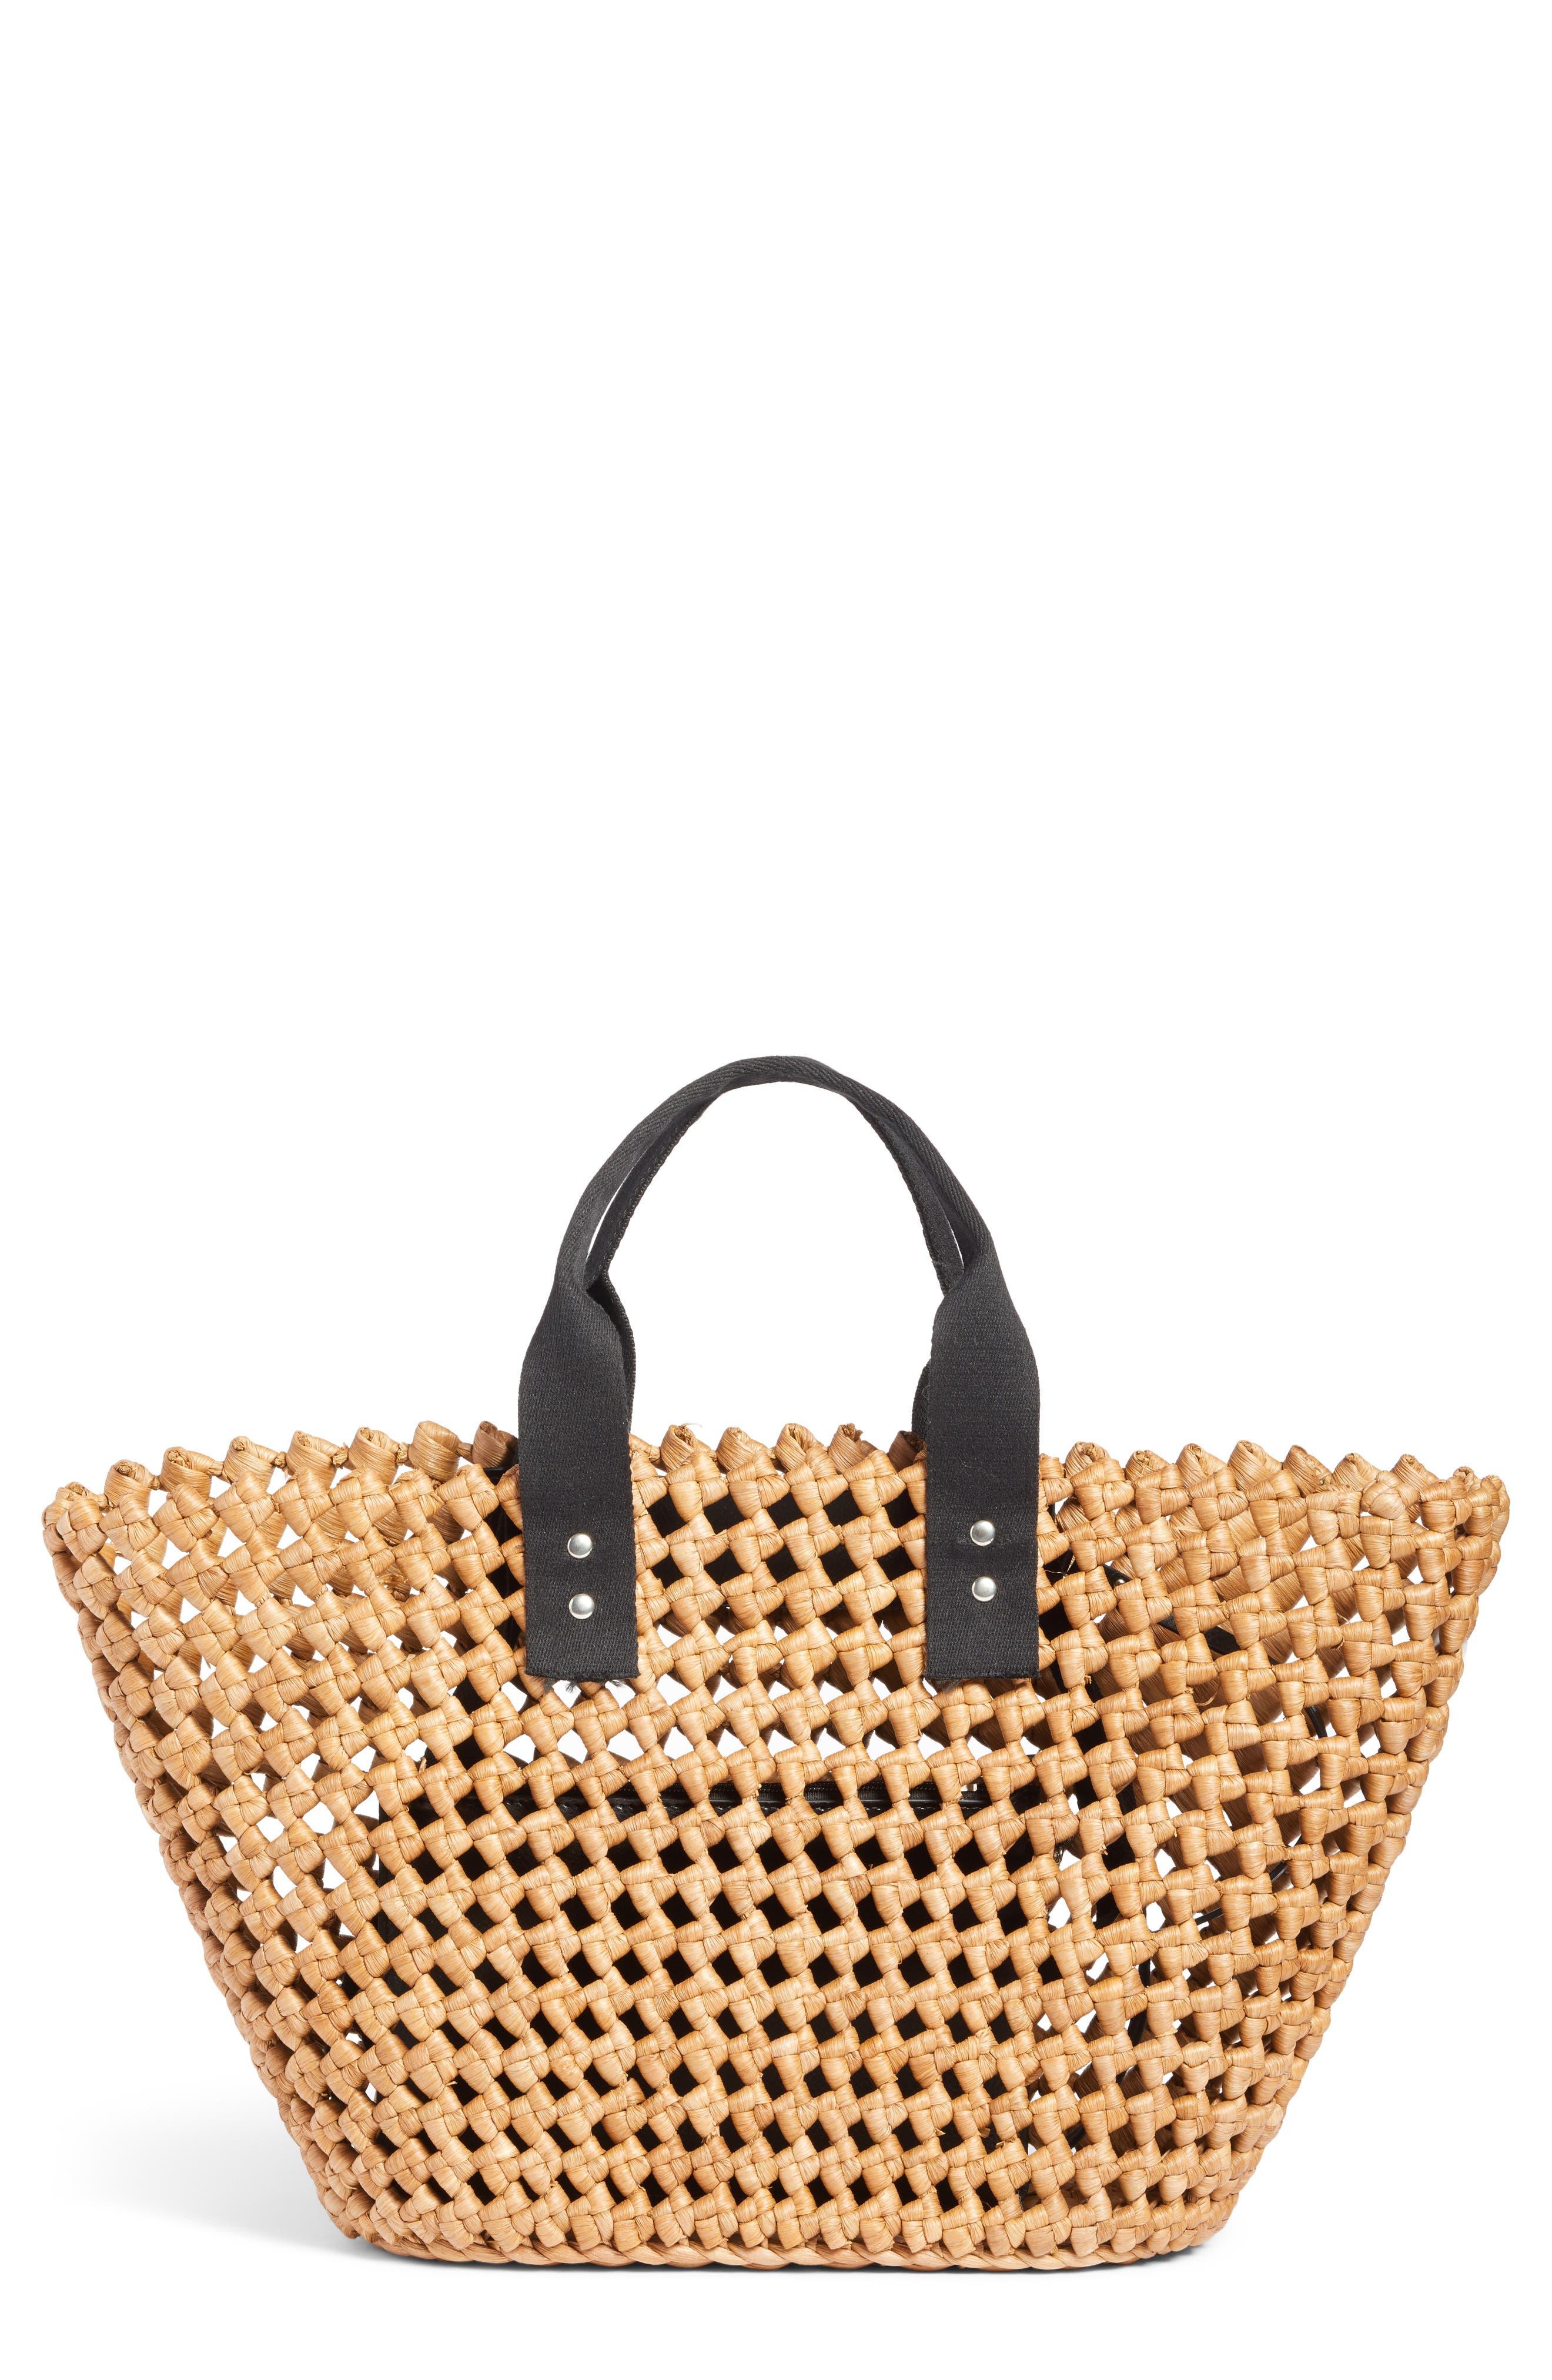 258e95805cf5 Straw Handbags & Purses | Nordstrom